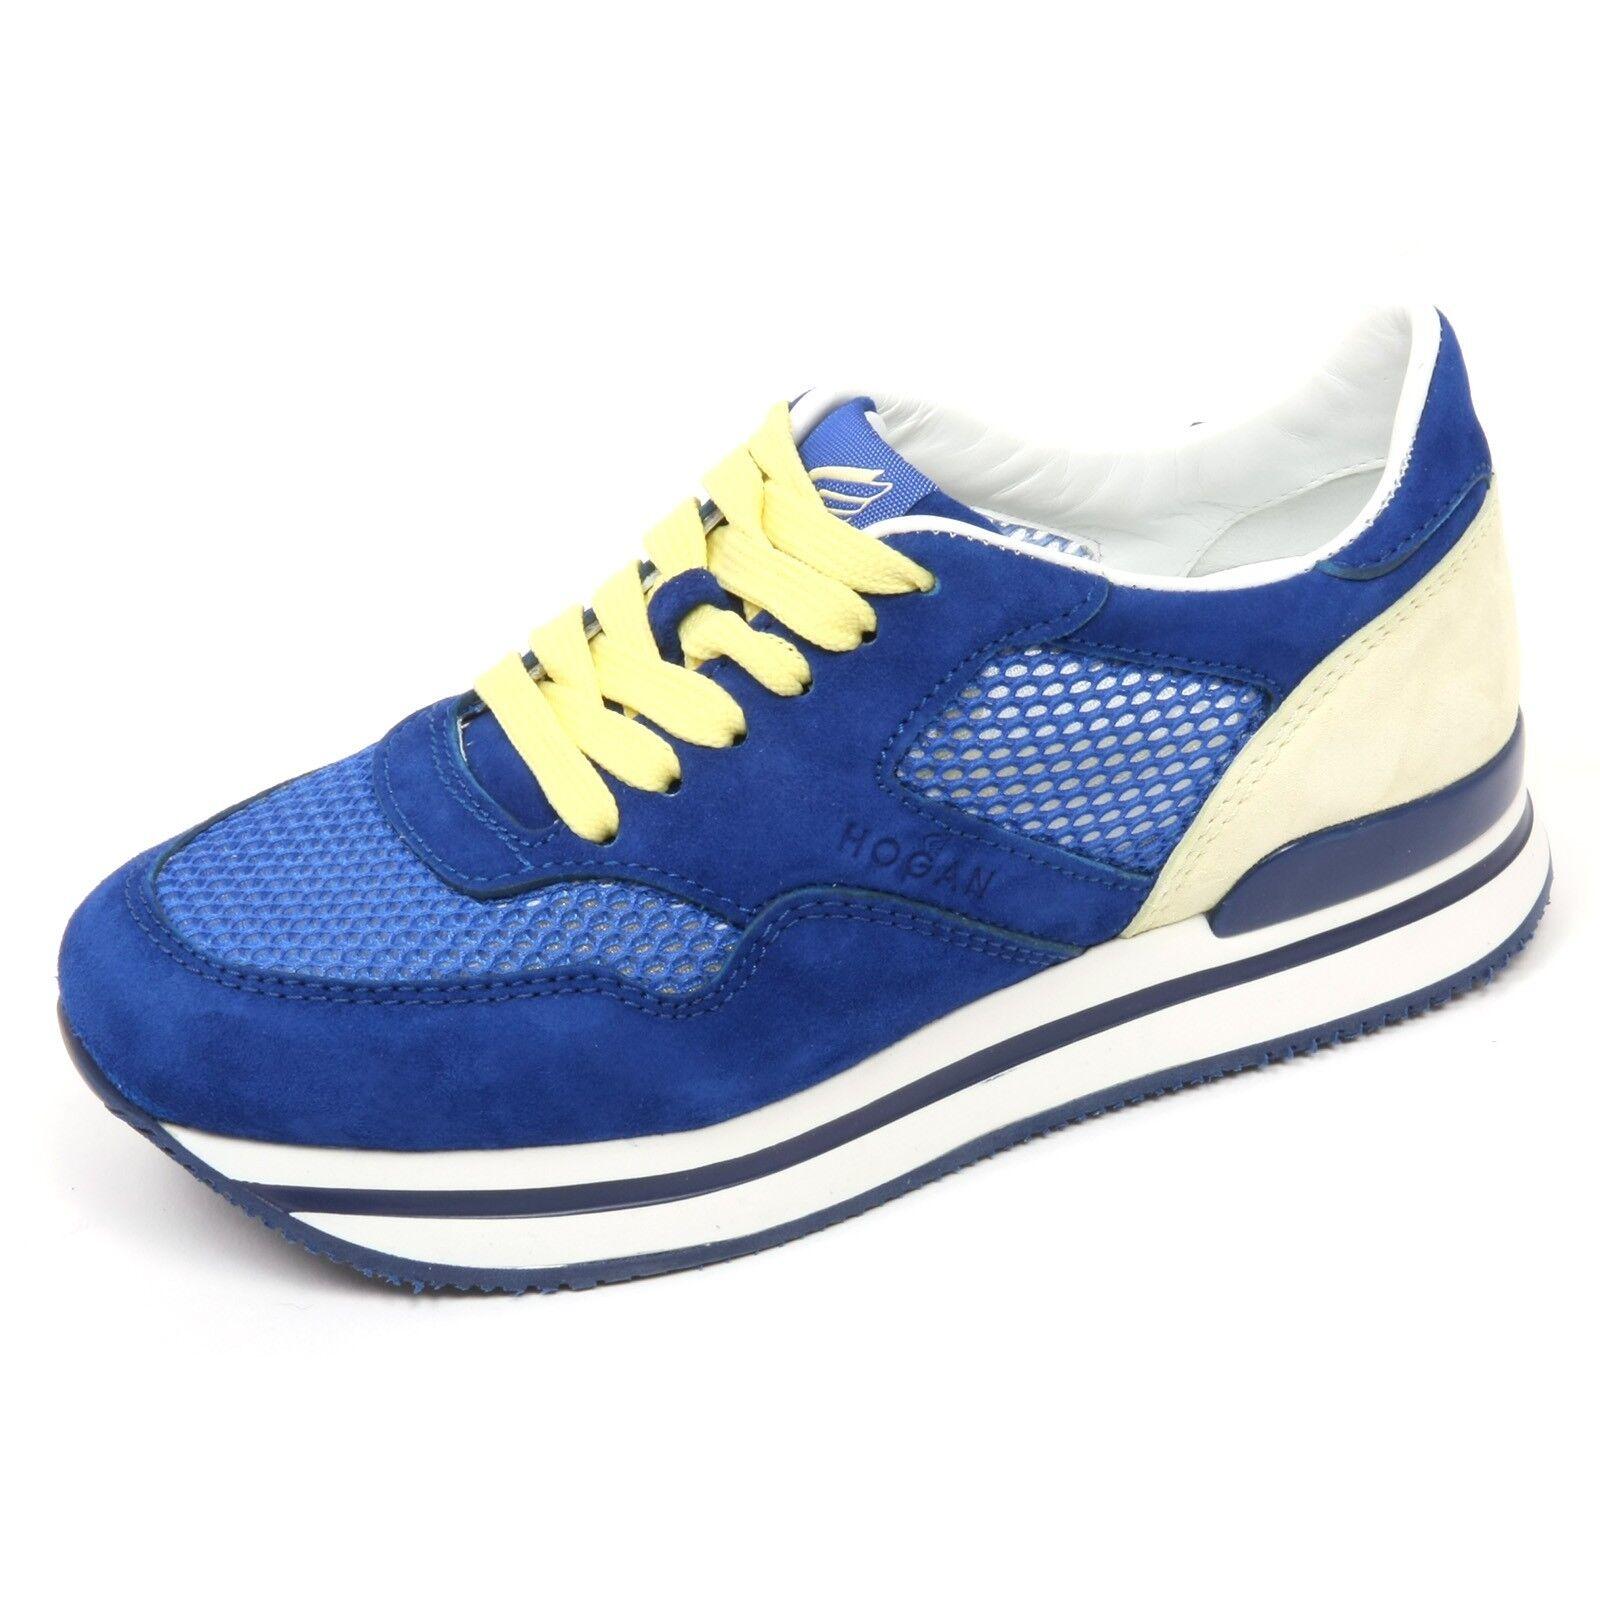 c7898 sneaker donna hogan h222 scarpa bluette crema shoes woman f9b4e0864b6